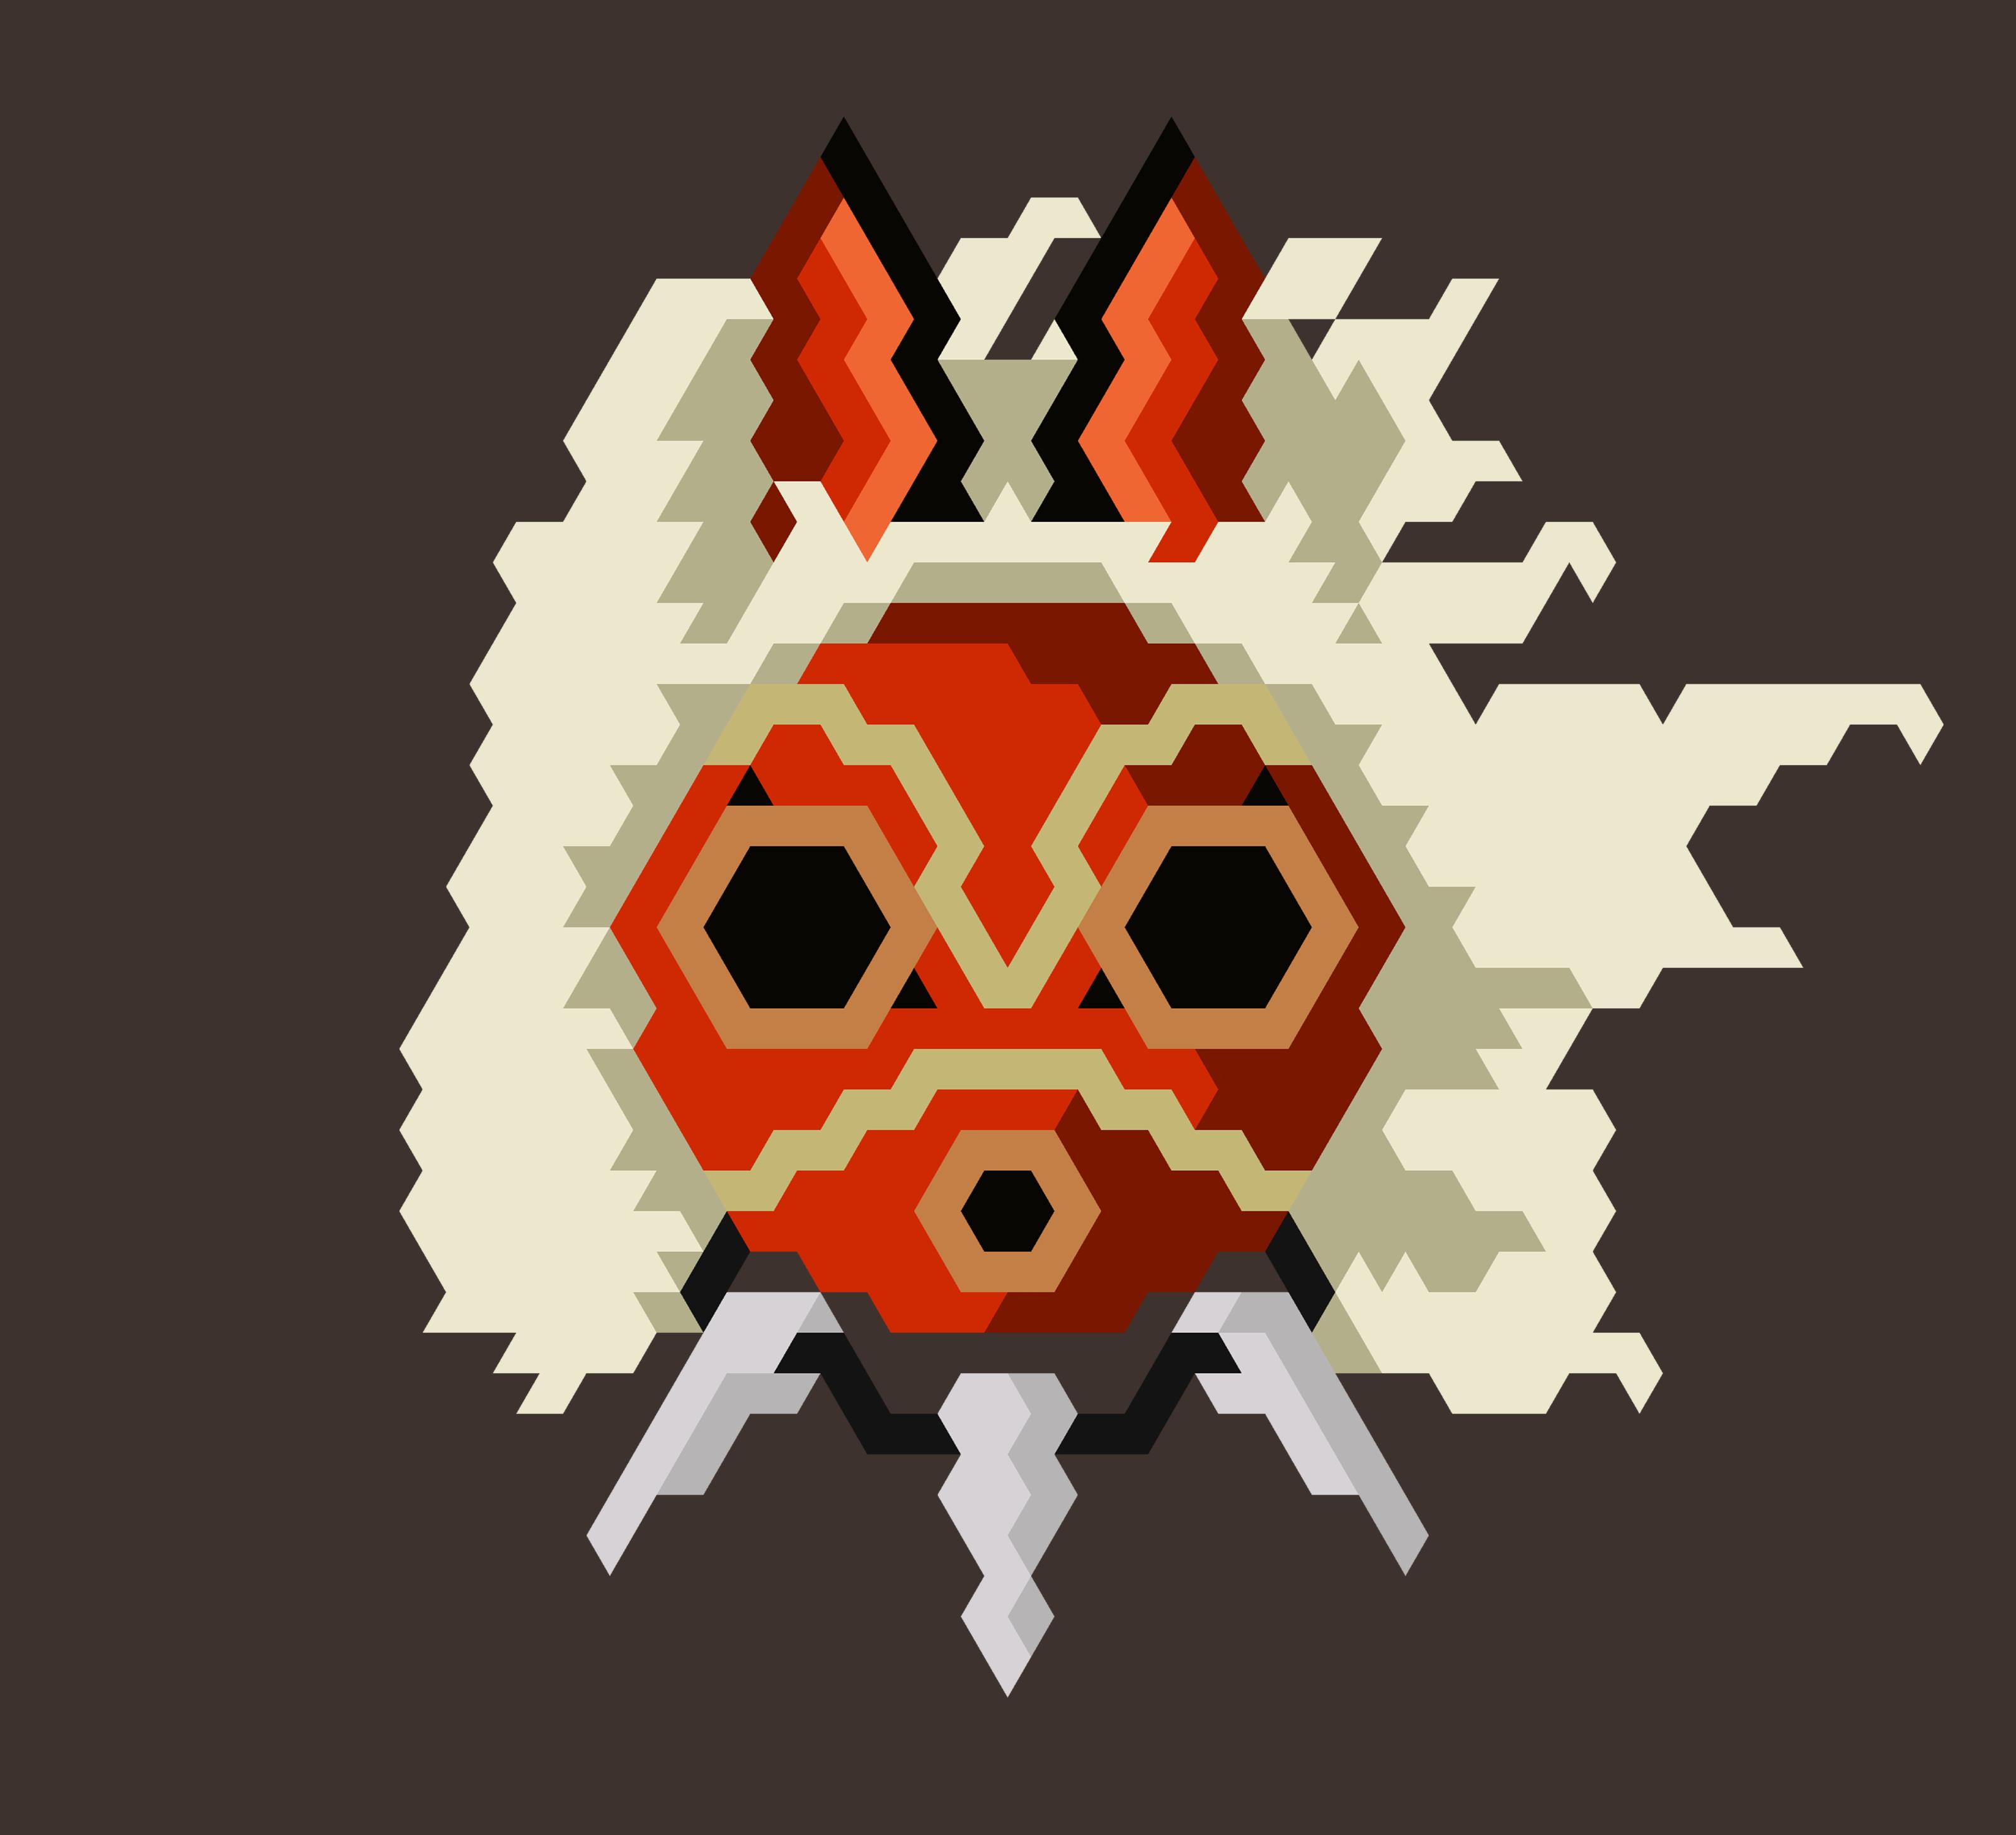 Princess mononoke san mask